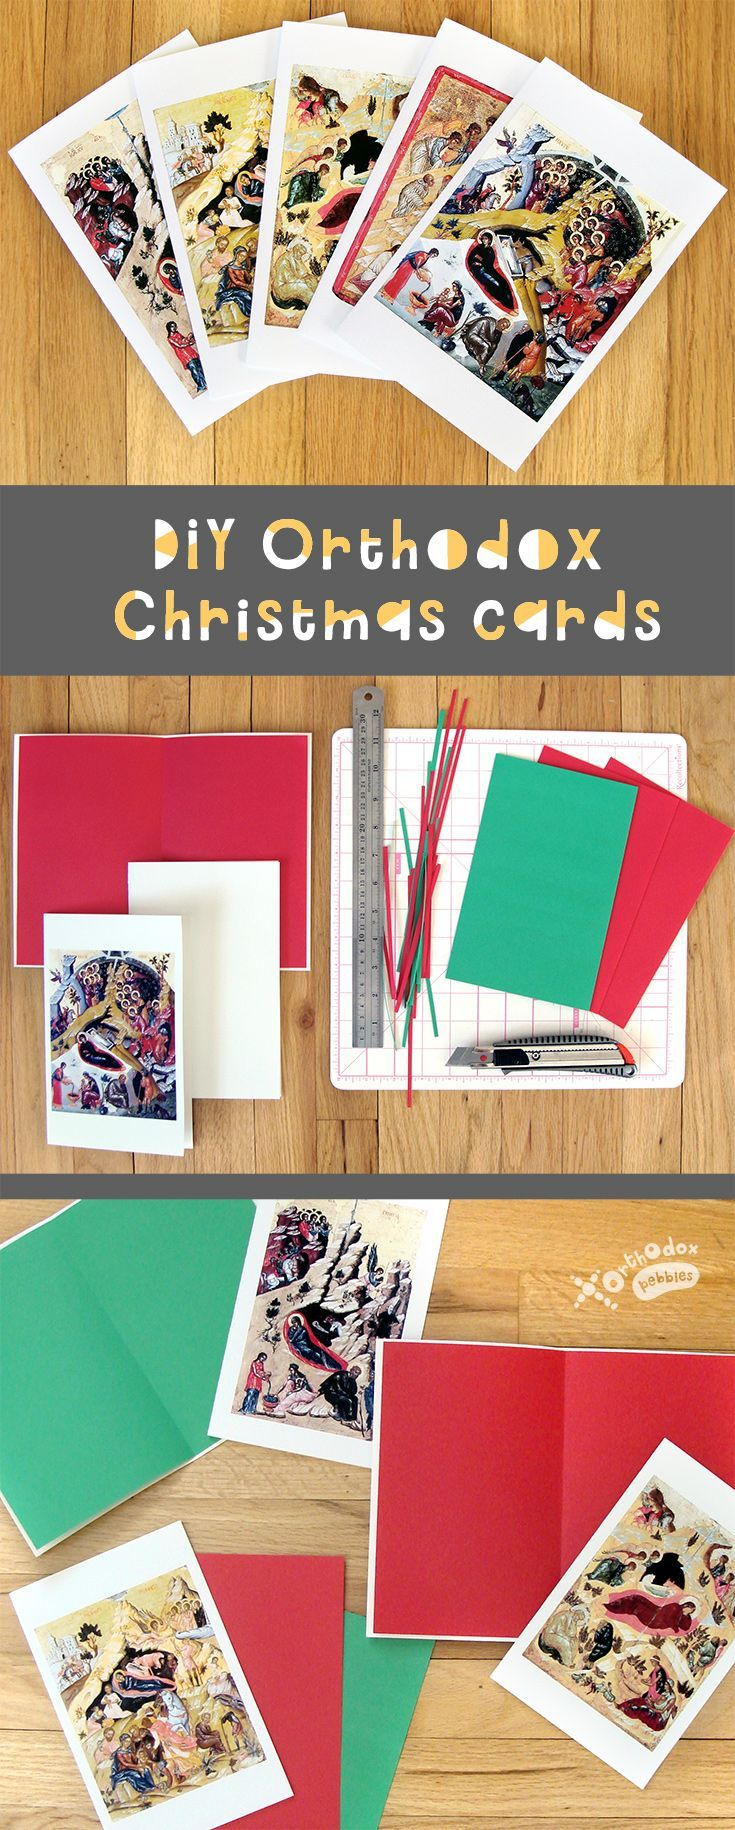 DIY Orthodox Christmas cards   Advent and Christmas   Pinterest ...